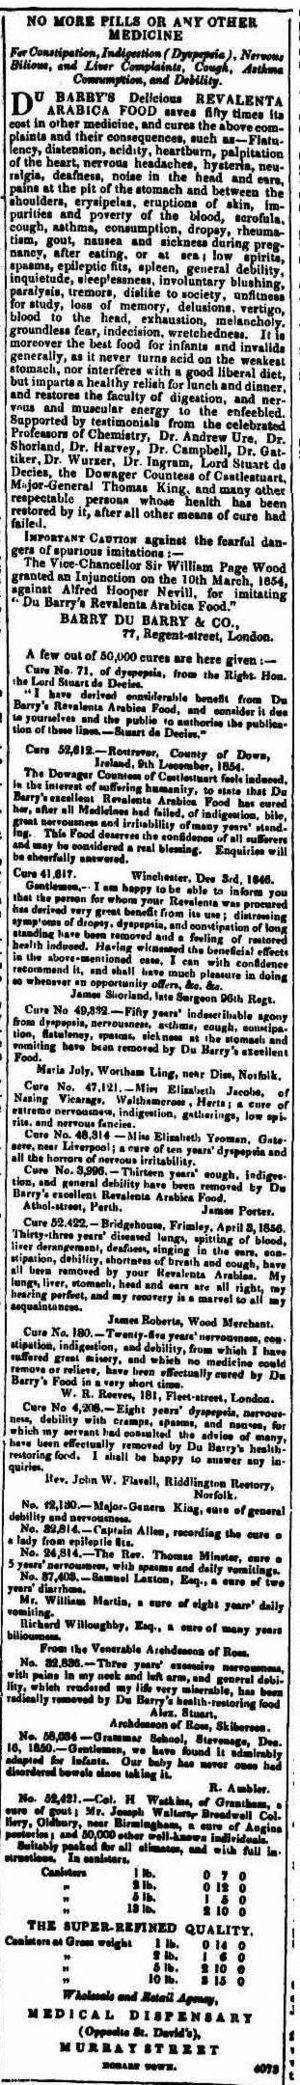 Revalenta arabica - Classified ad for Revalenta arabica from The Courier (Hobart, Tasmania) November 1, 1856, p. 4.